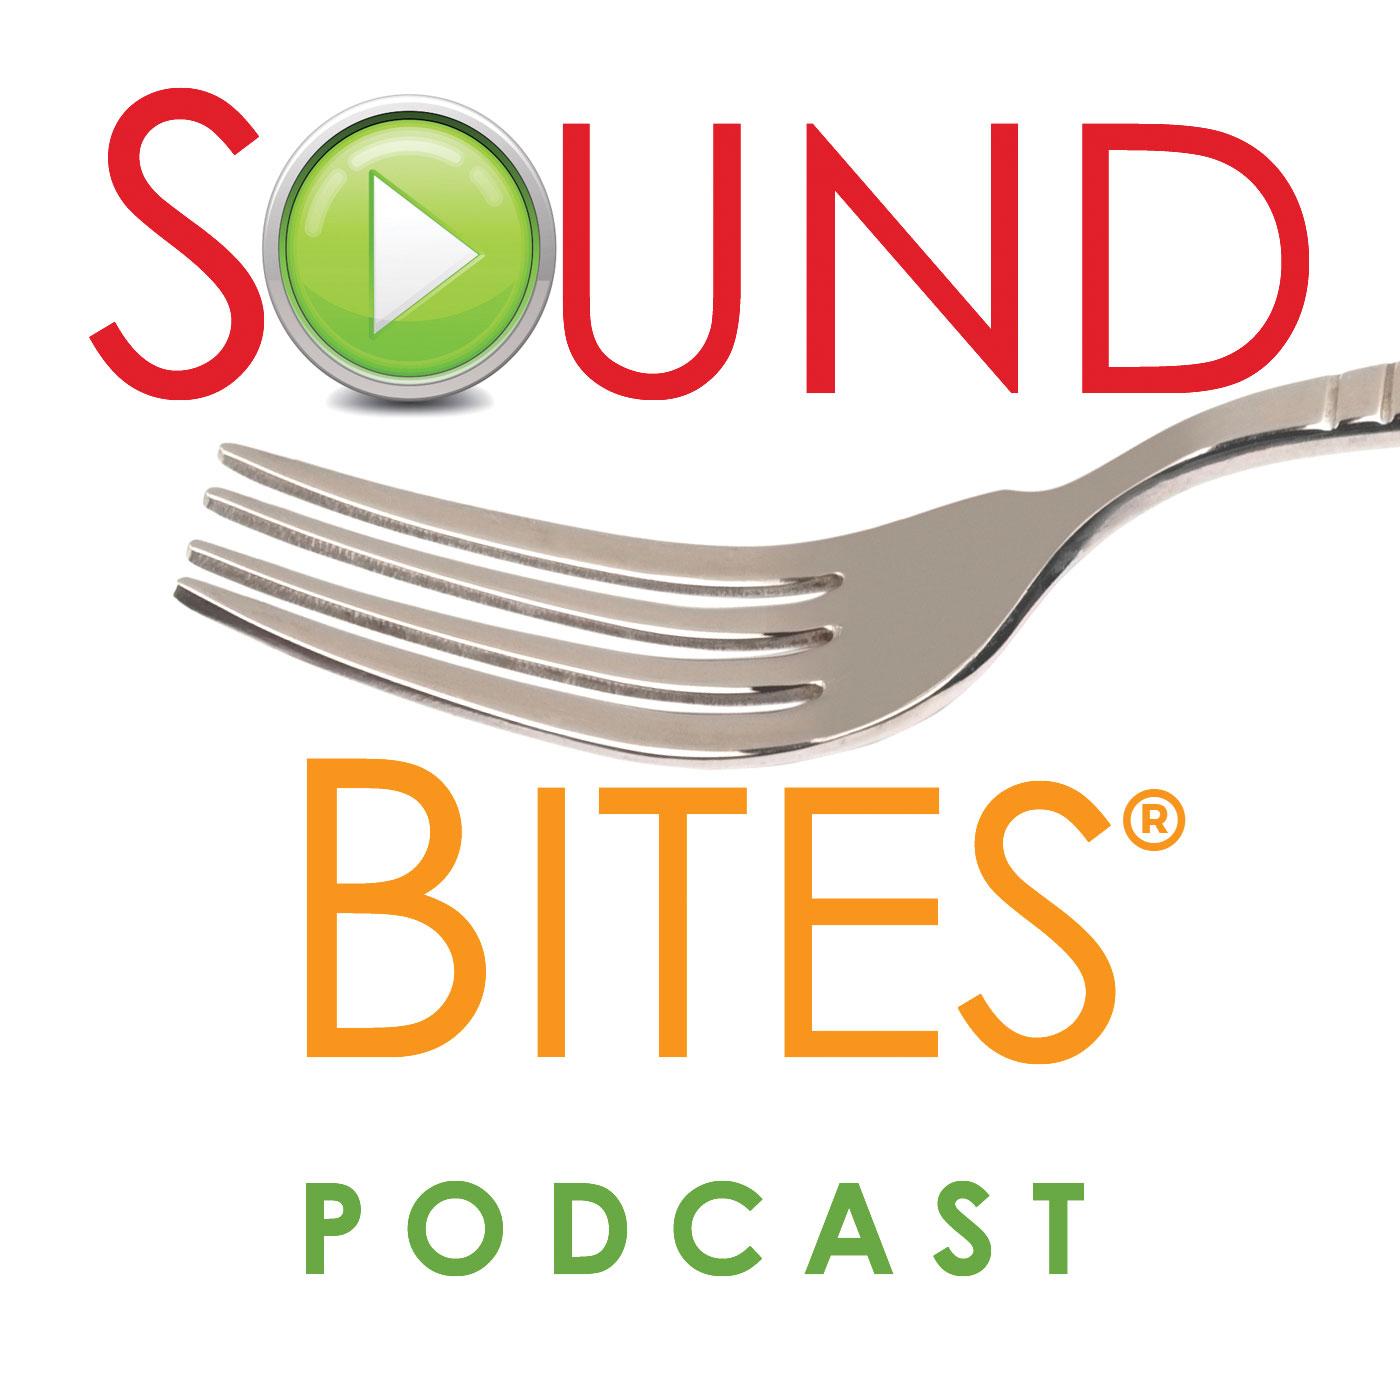 Sound Bites nutrition podcasts logo